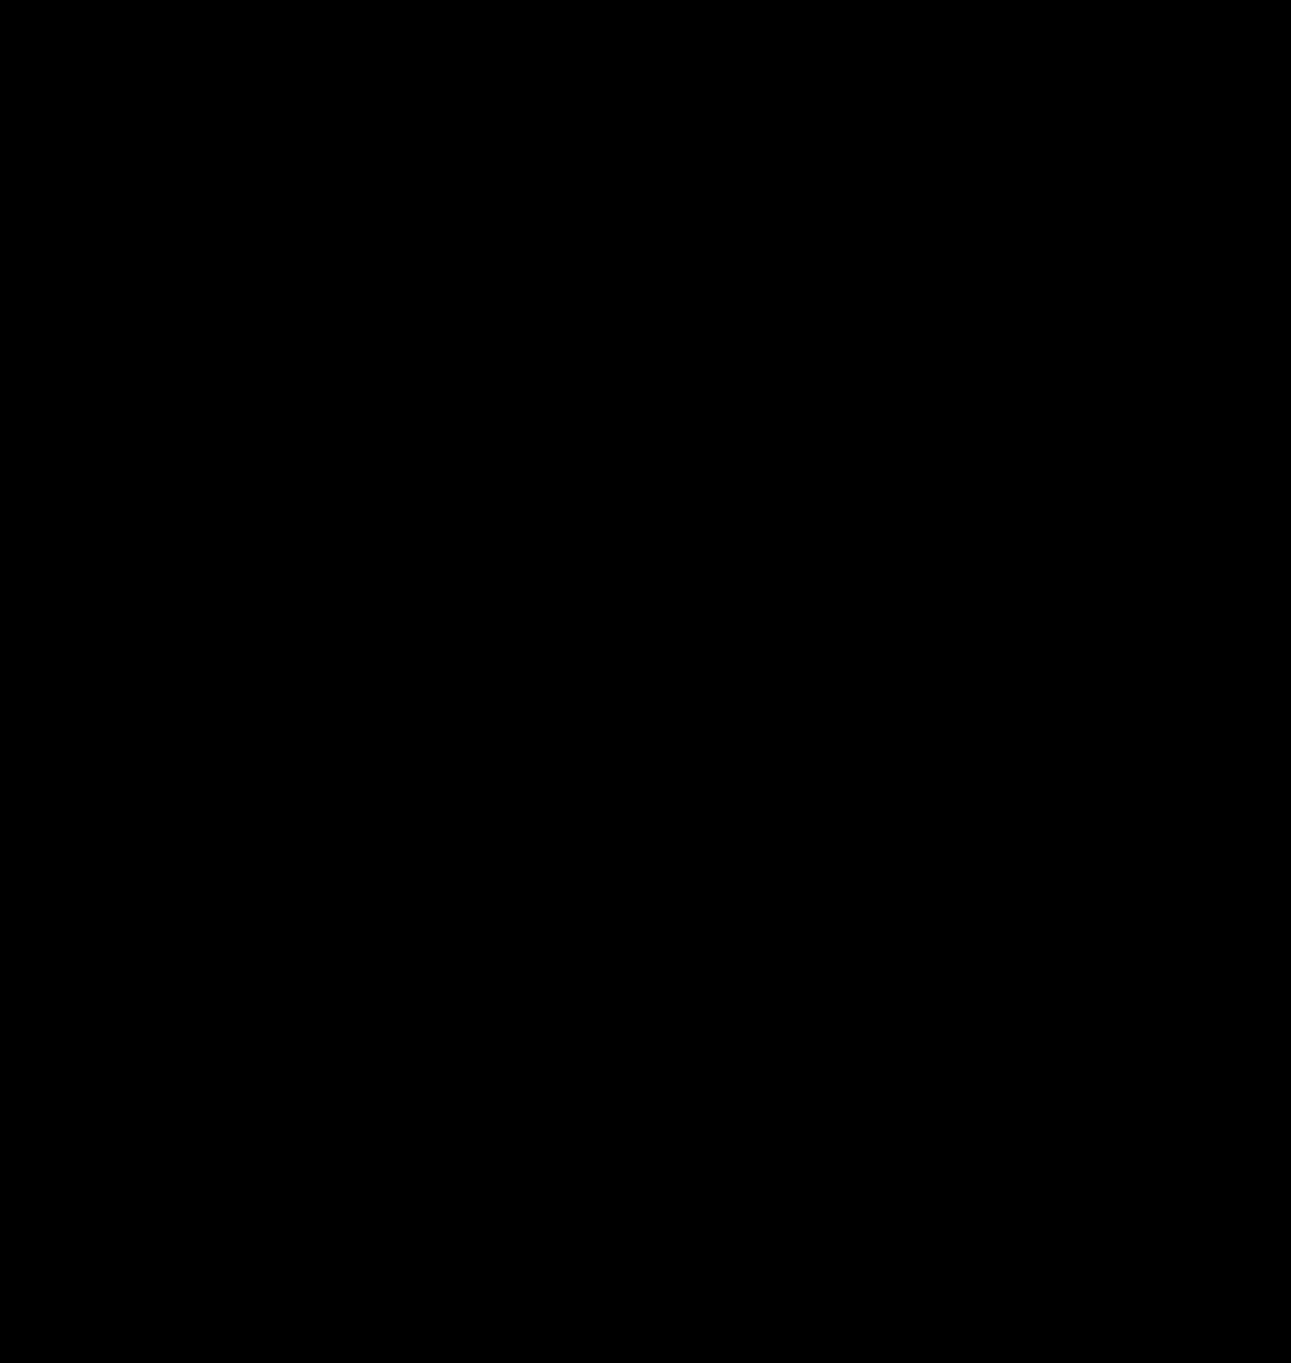 Drawing at getdrawings com. Longhorn clipart sugar skull